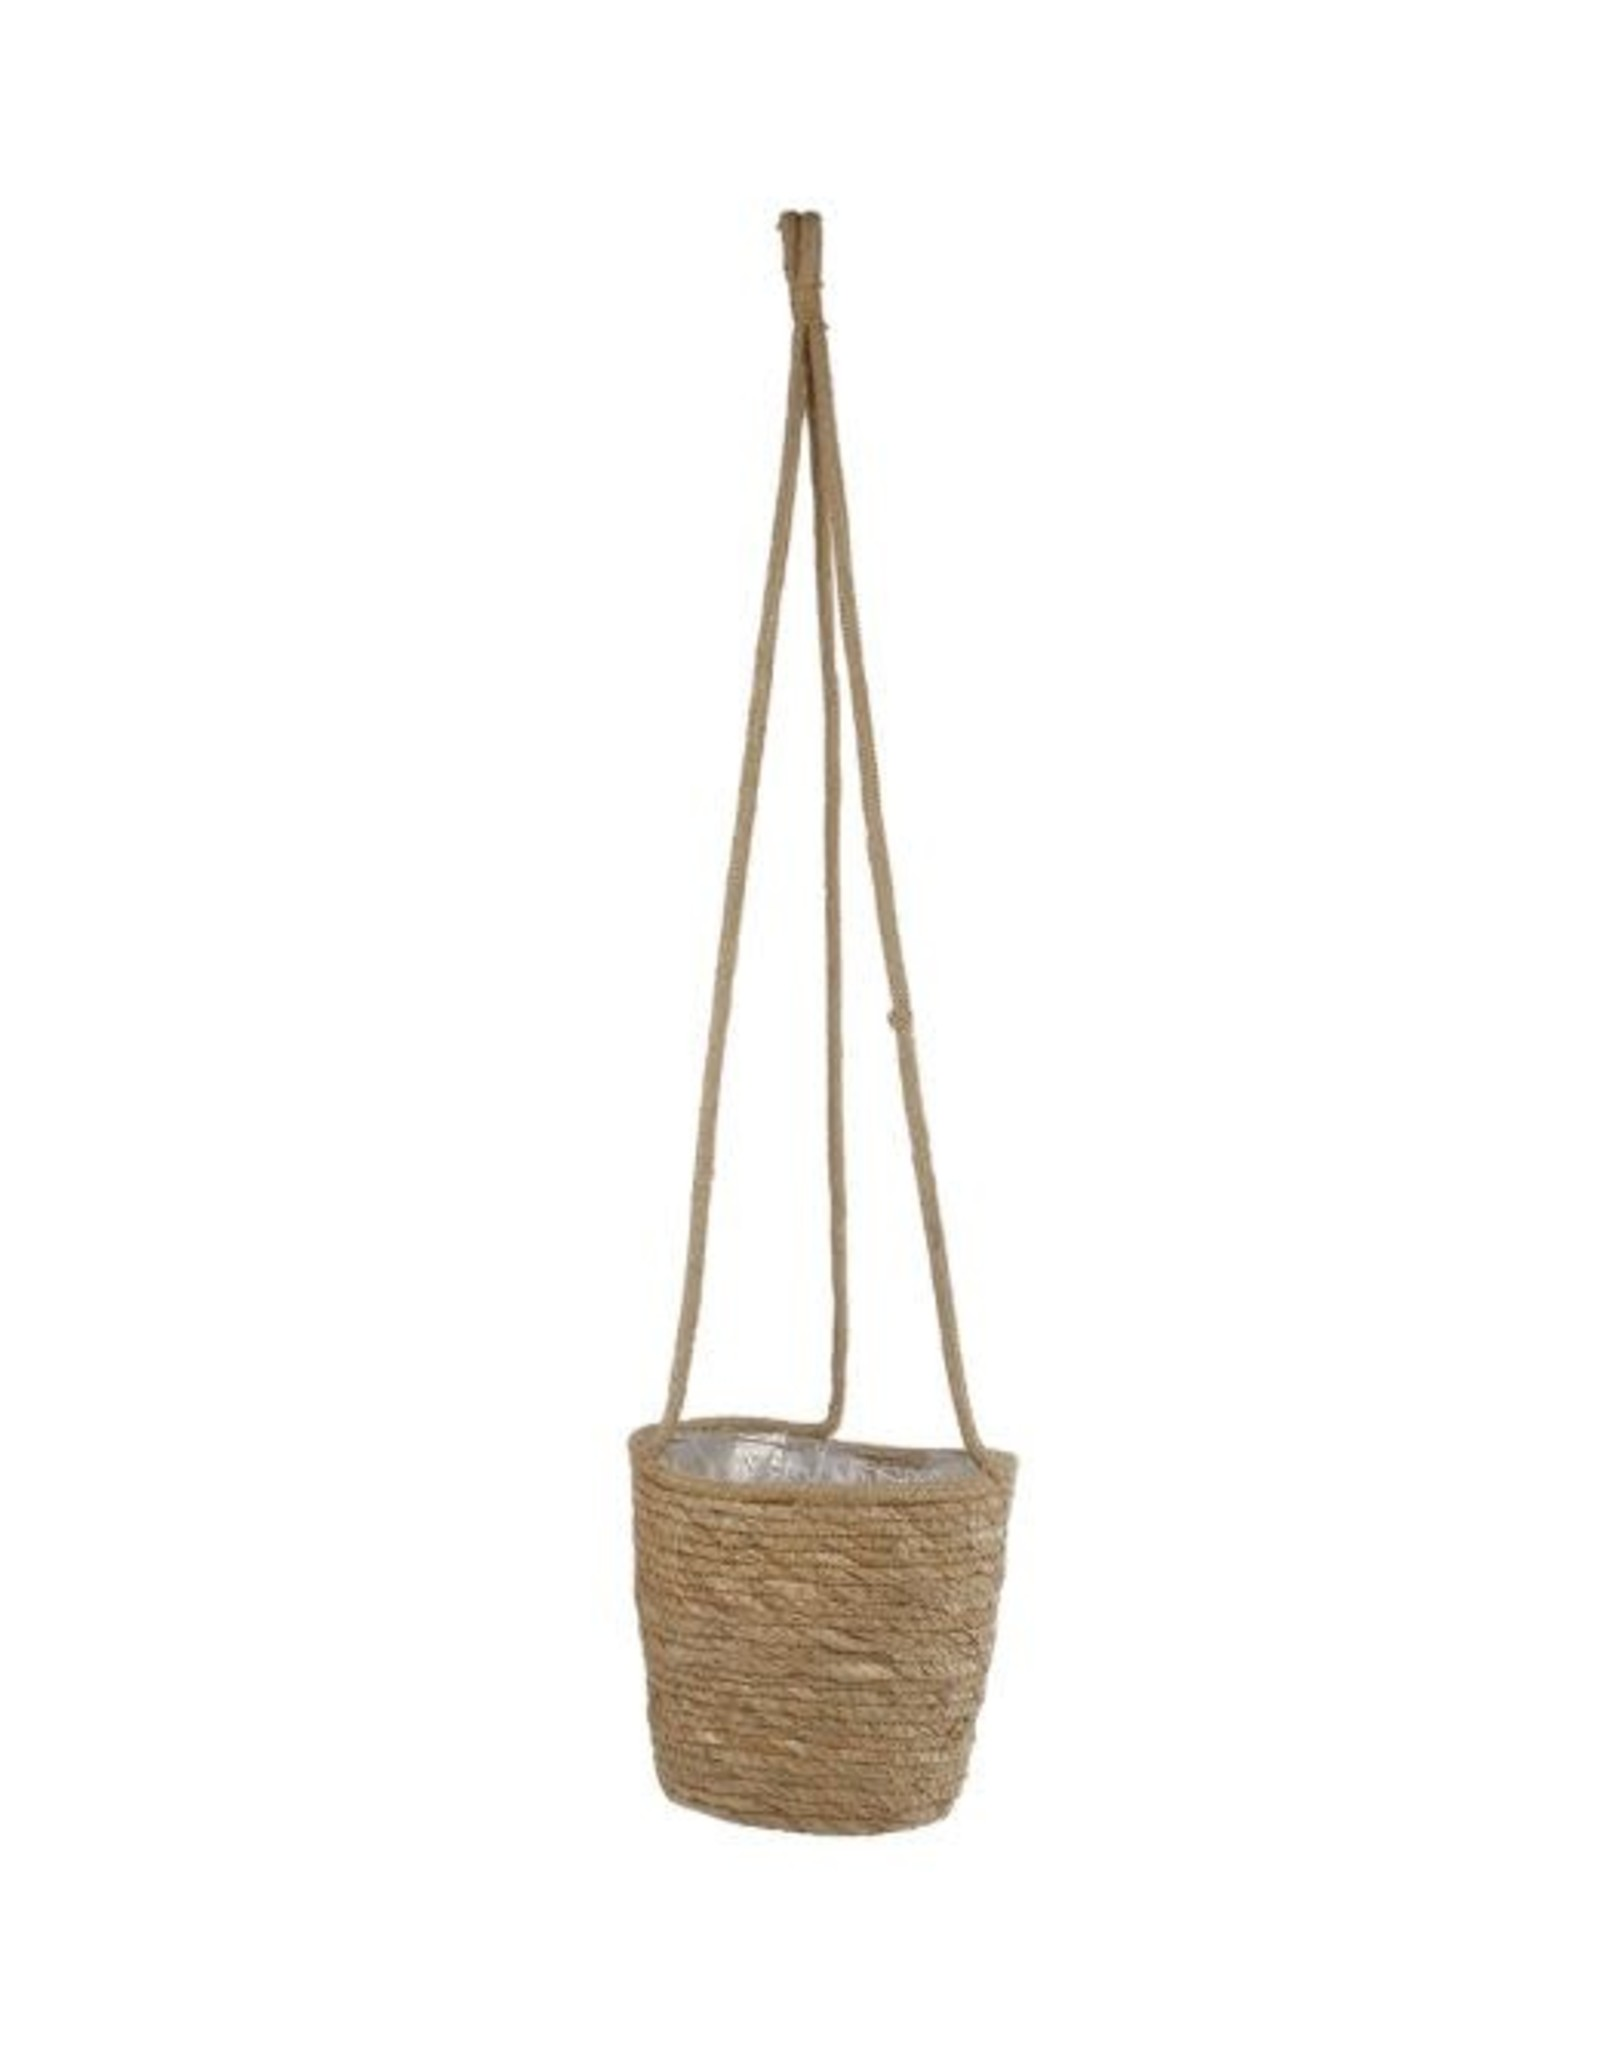 Hangmand conisch Arno M naturel pot 17 20x20x17,5cm